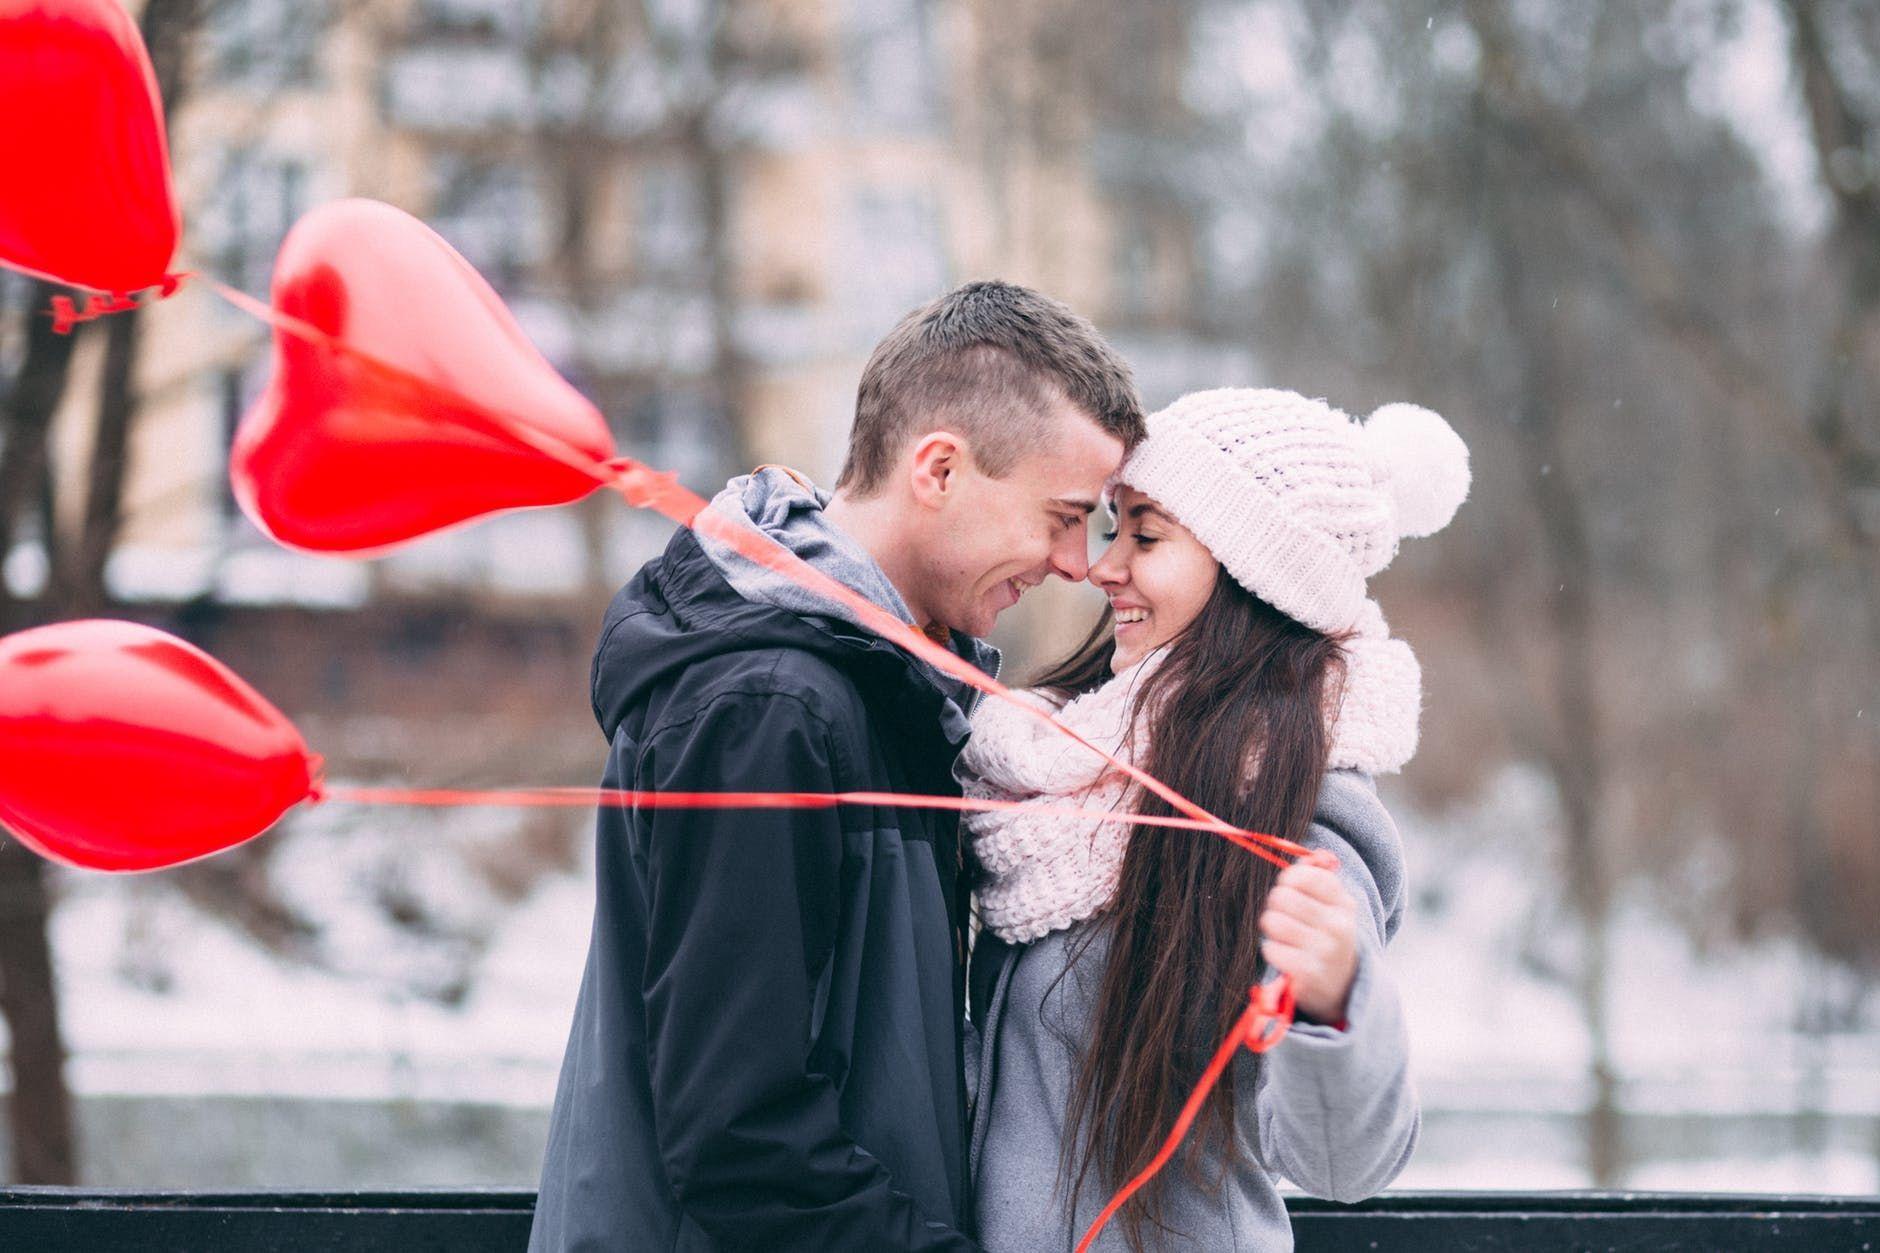 20 Kata Kata Happy Anniversary Buat Pacar Yang Romantis